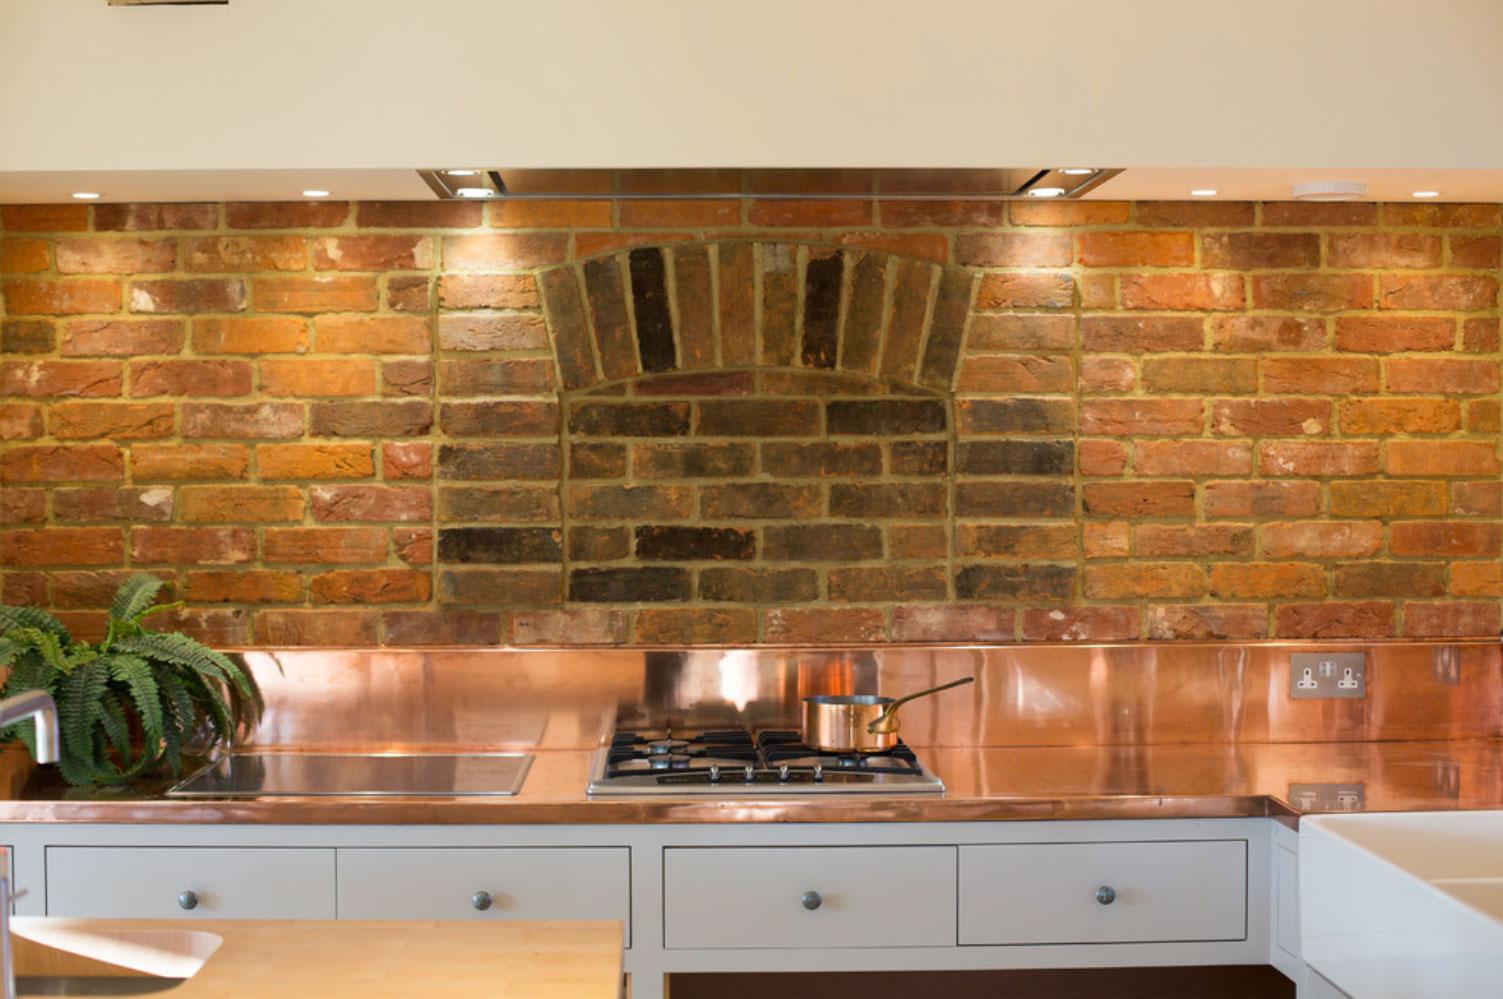 Most Durable Kitchen Worktop Material